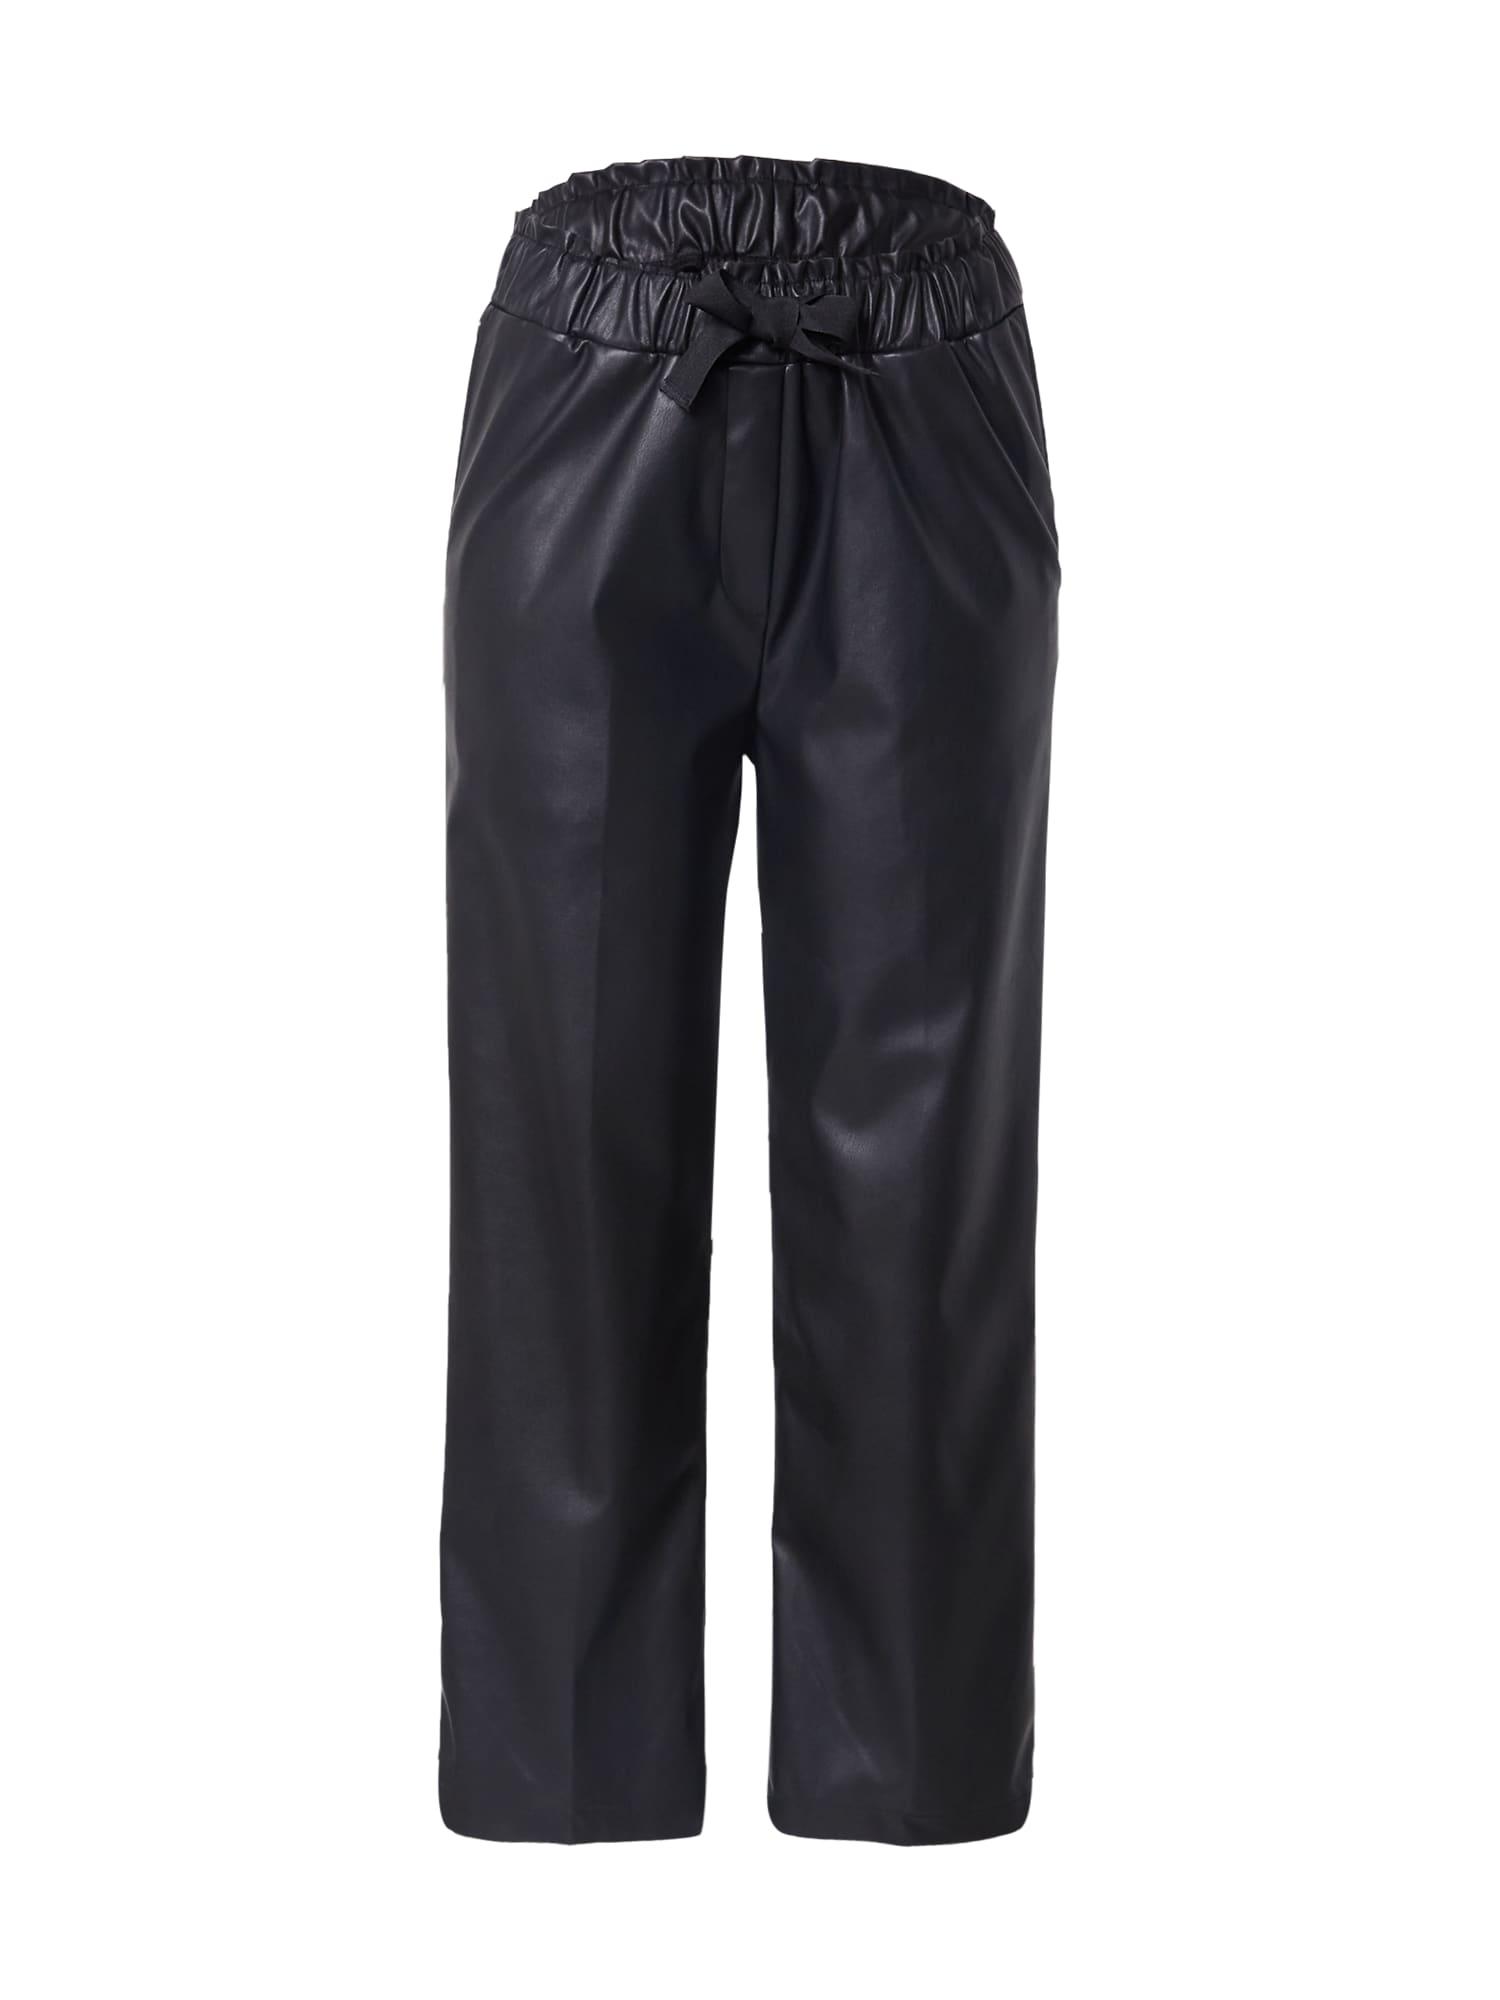 Princess Pantalon  - Noir - Taille: 34 - female